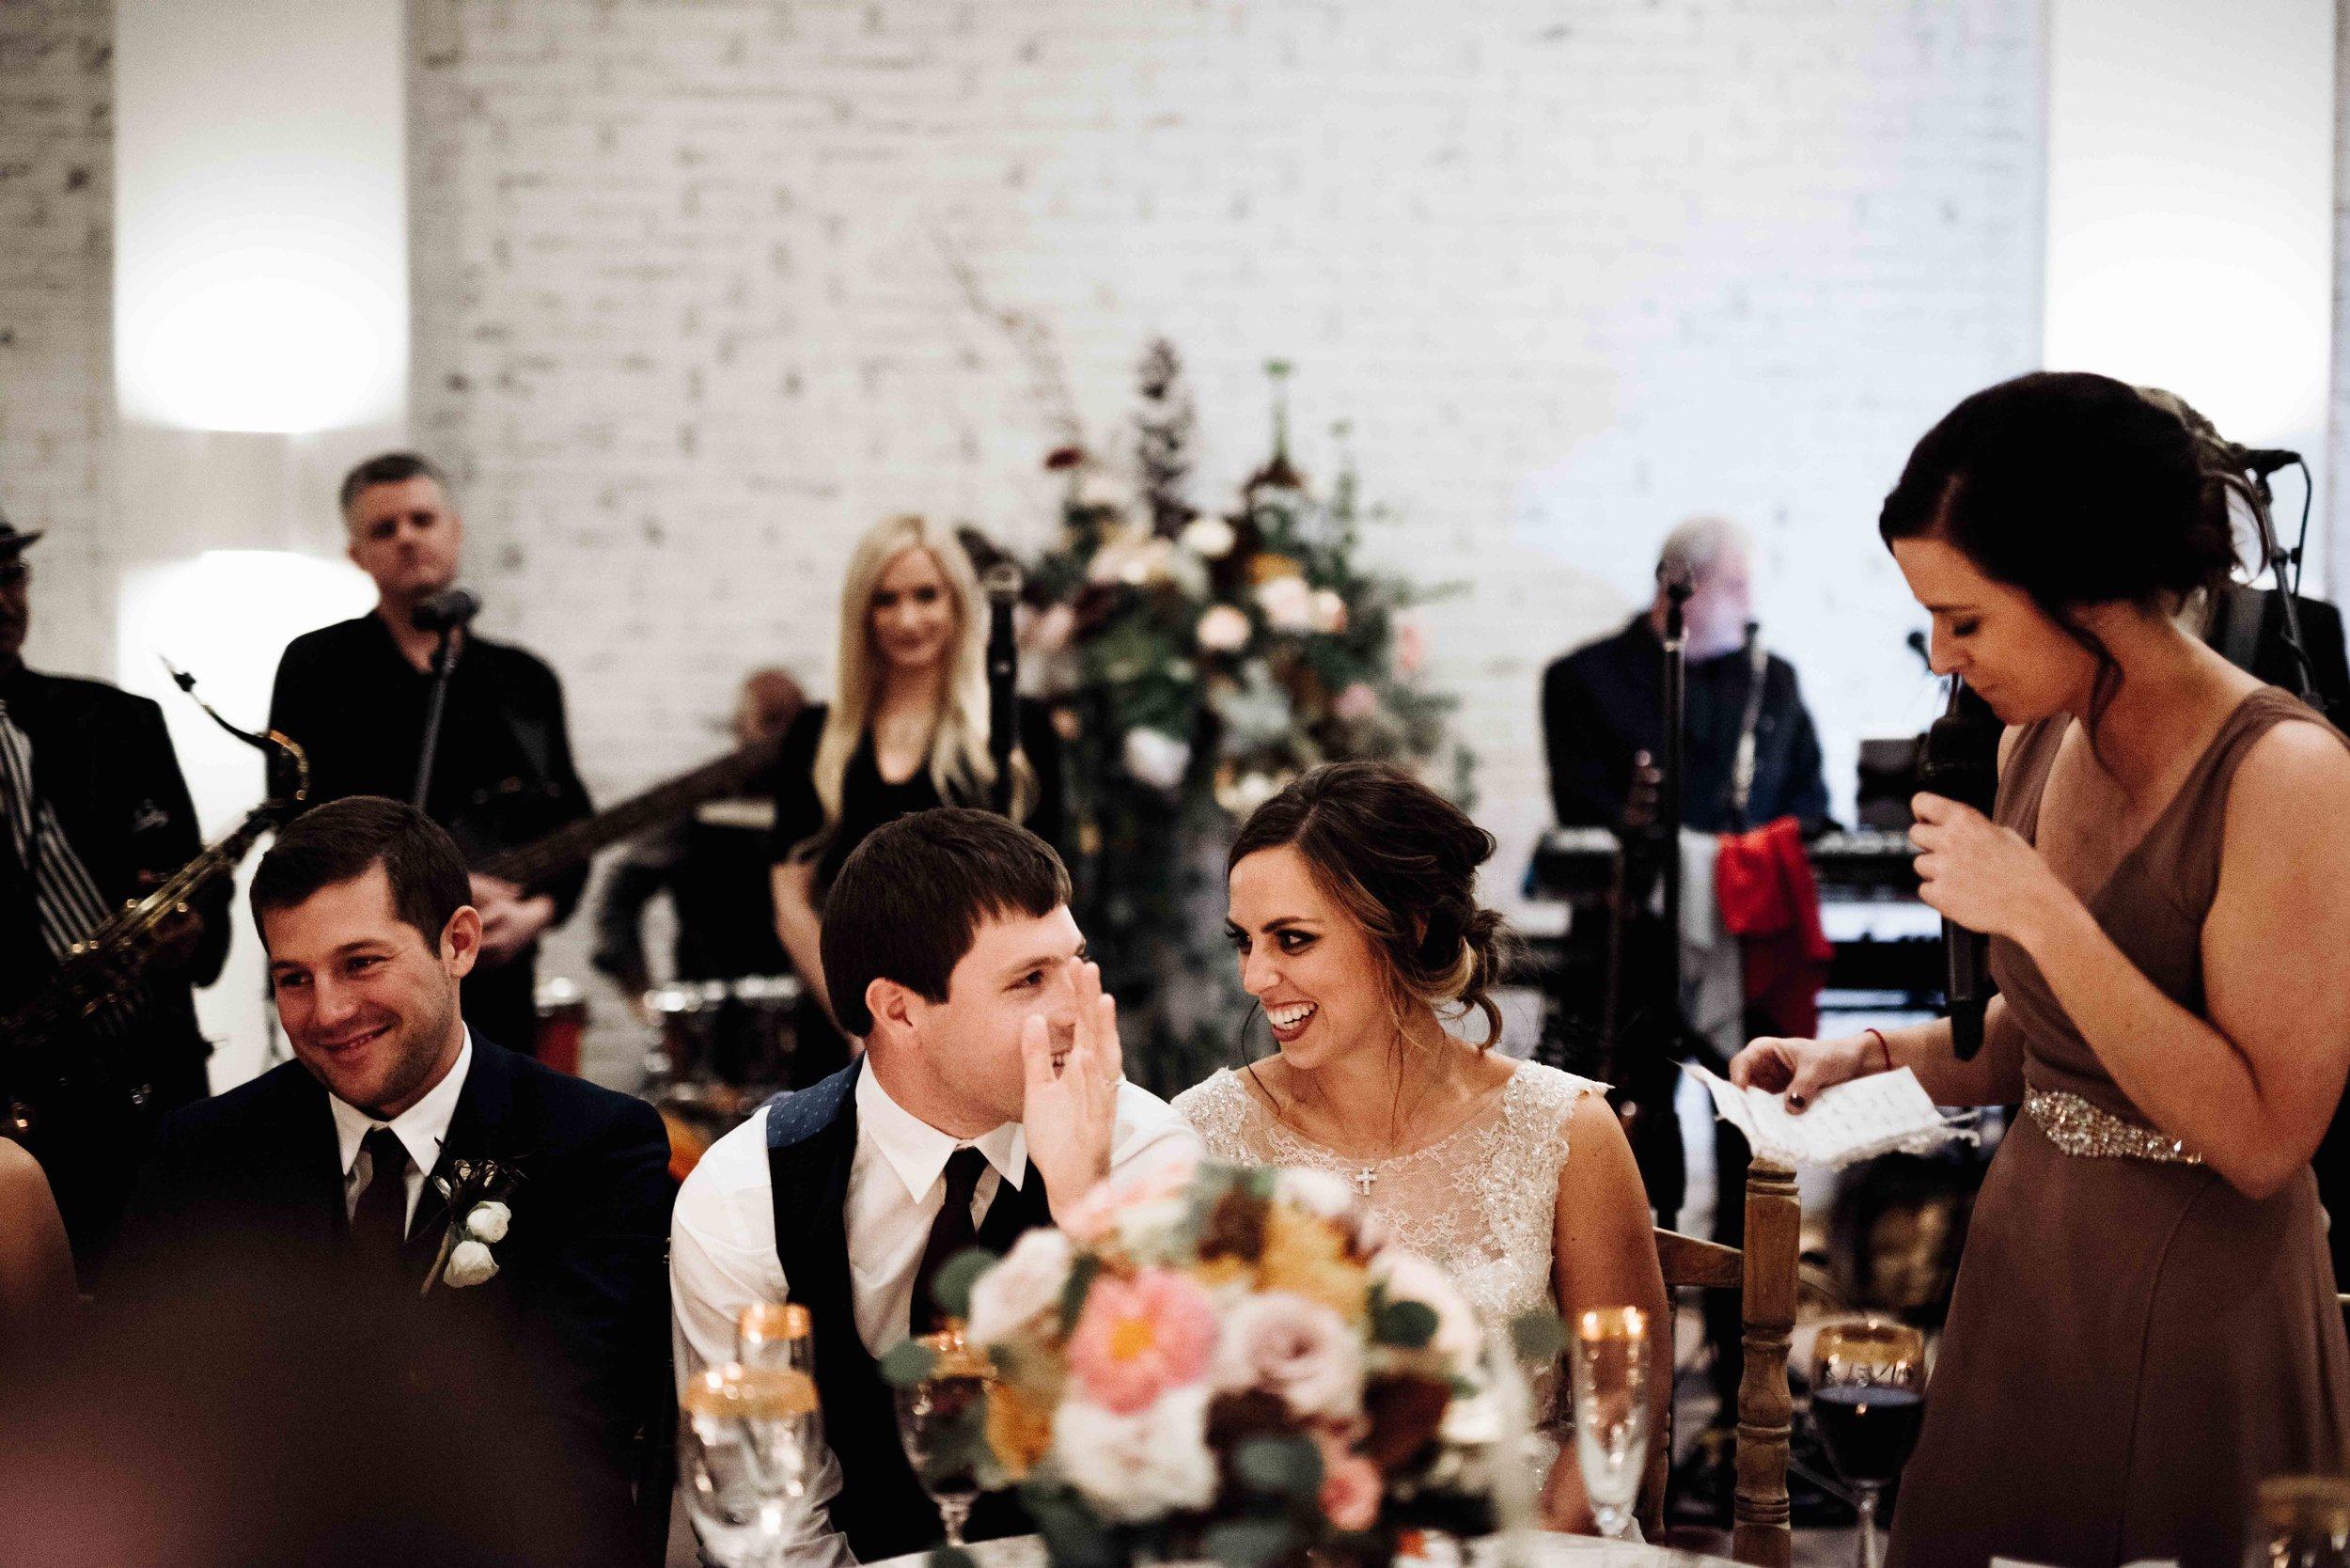 Carlee-Bob-Indianapolis-Wedding-Blog-108.jpg